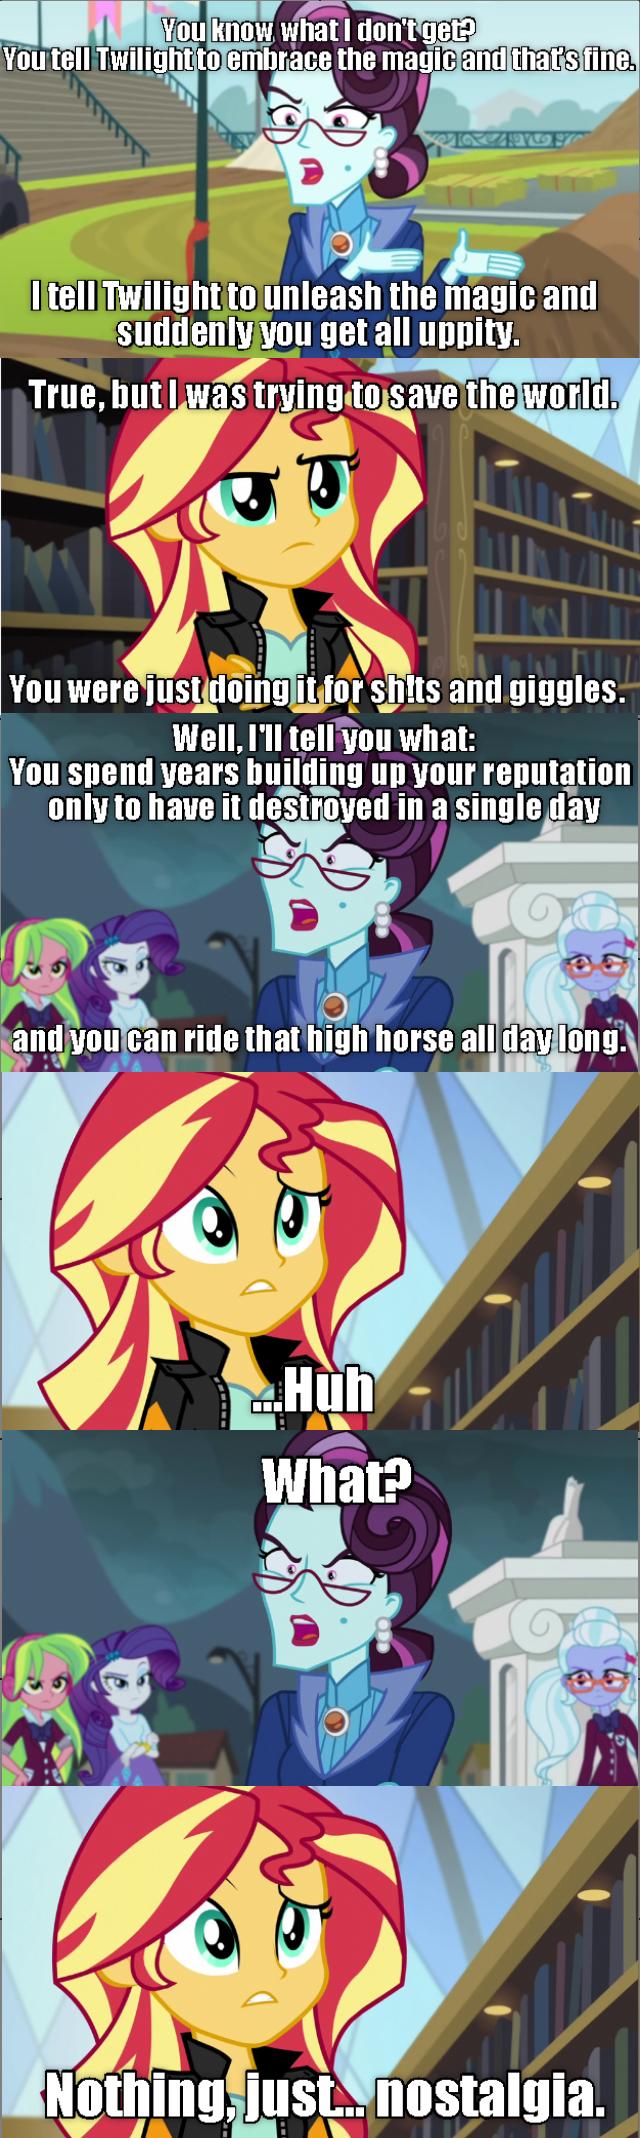 equestria girls screencap comic sunset shimmer friendship games - 9067576832